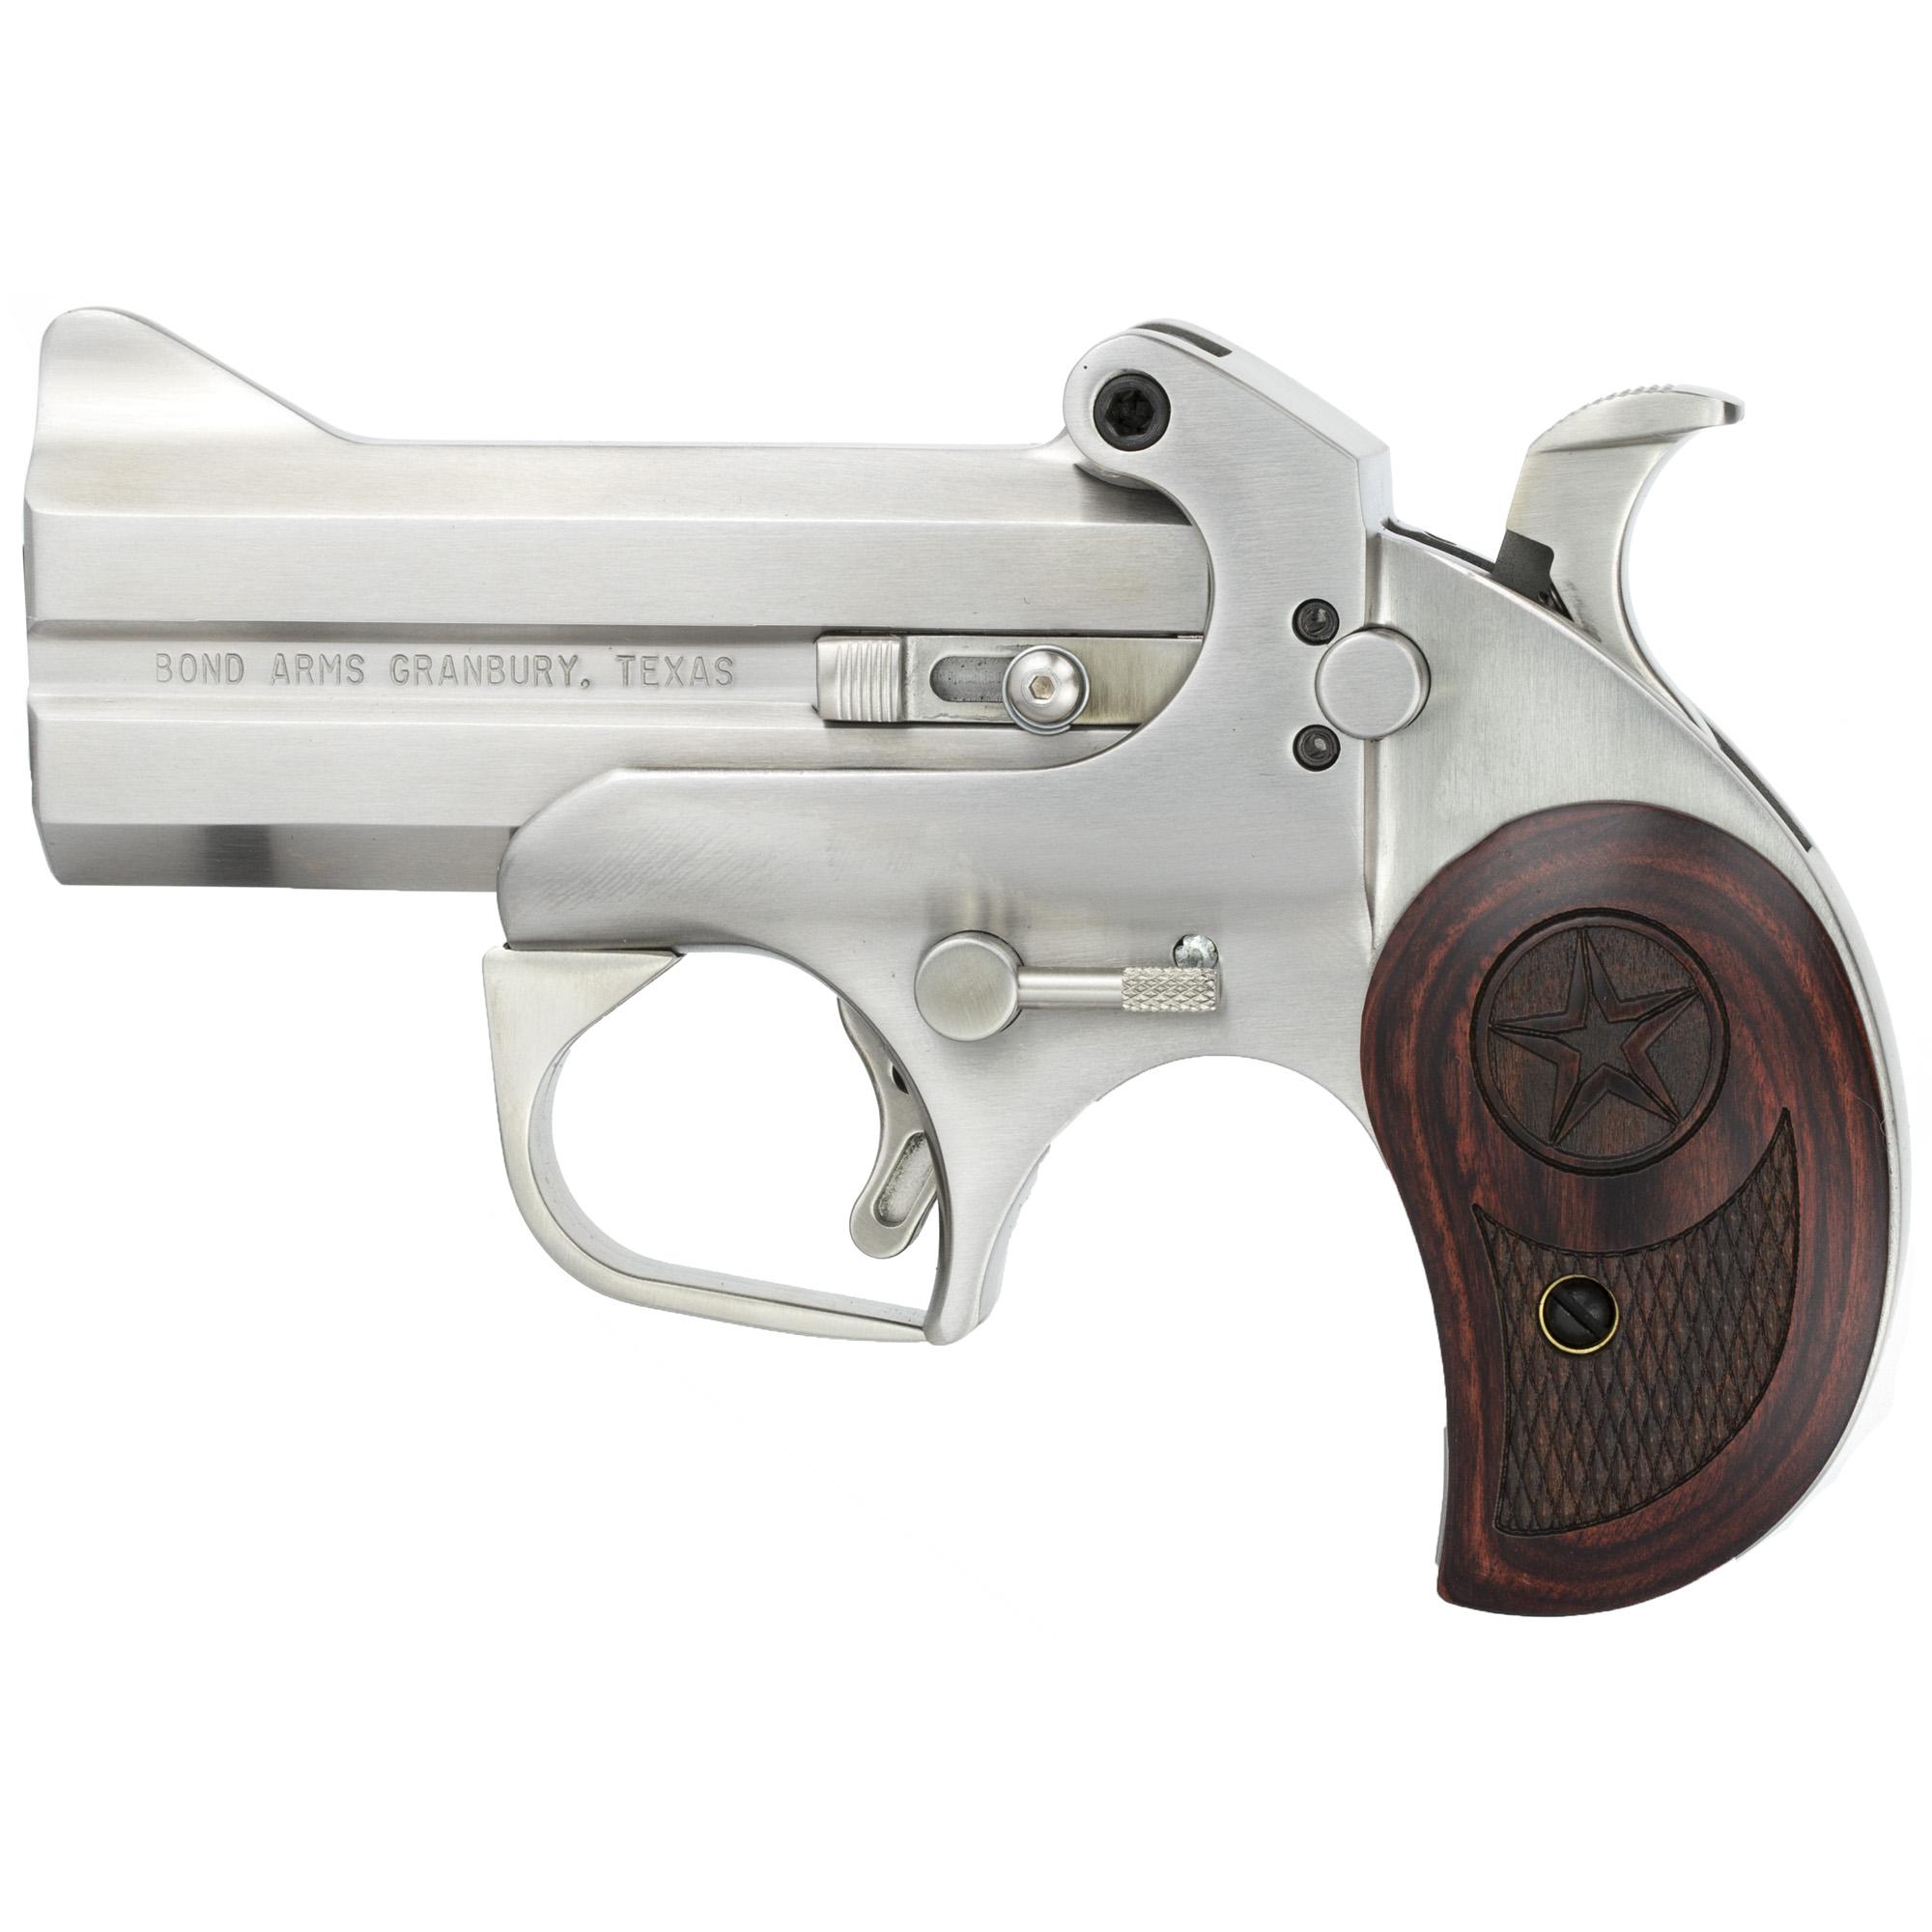 "Bond C2k Defender 45lc/410 W/tg 3.5"""